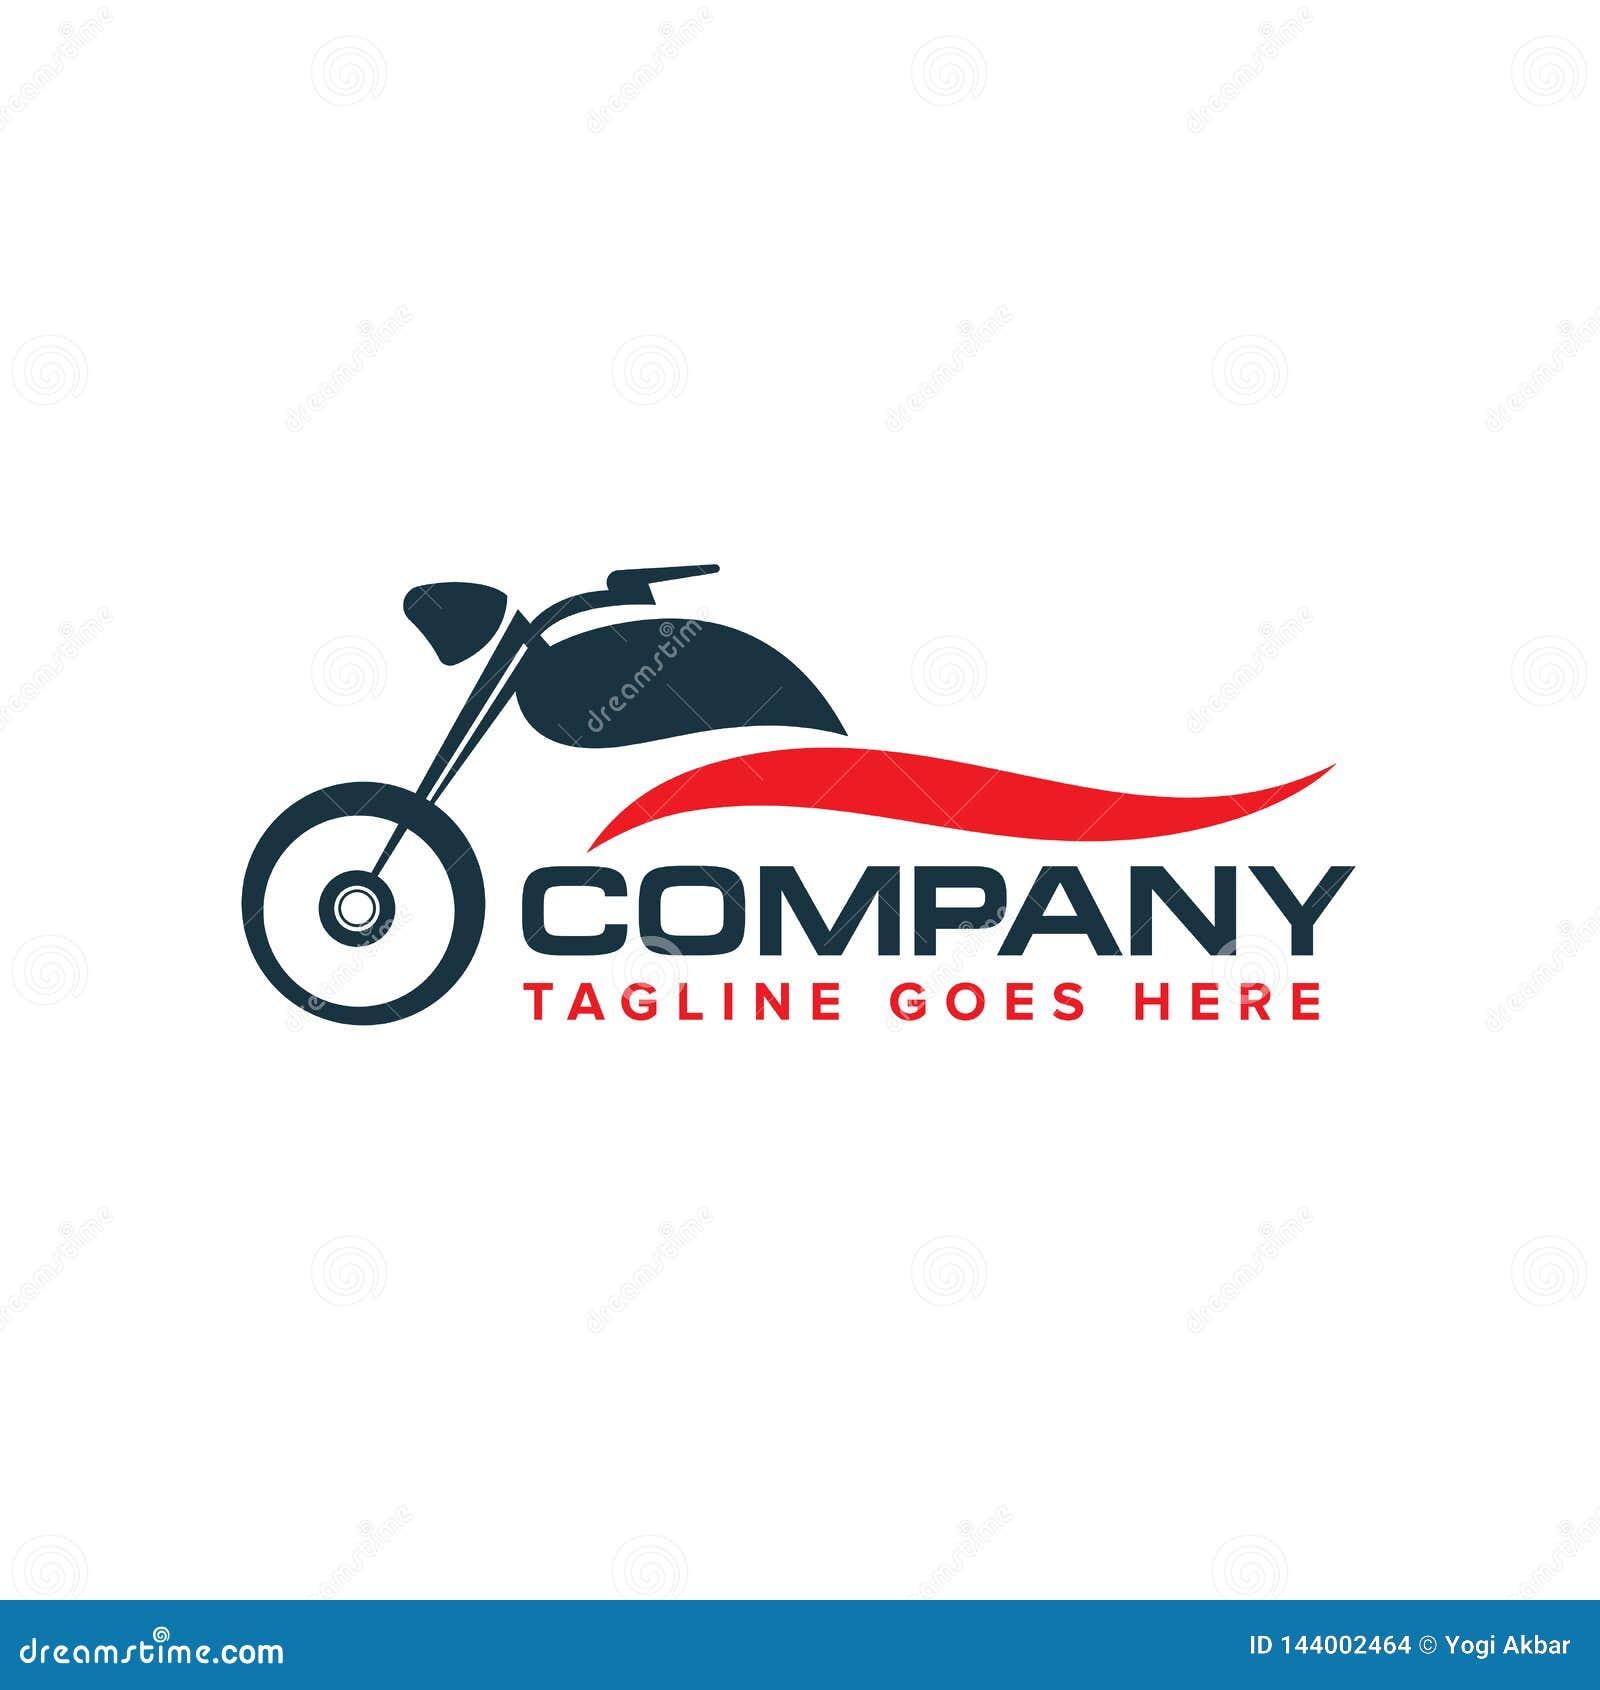 Auto Motorbikes Logo Design Vector Stock Vector Illustration Of Power Garage 144002464